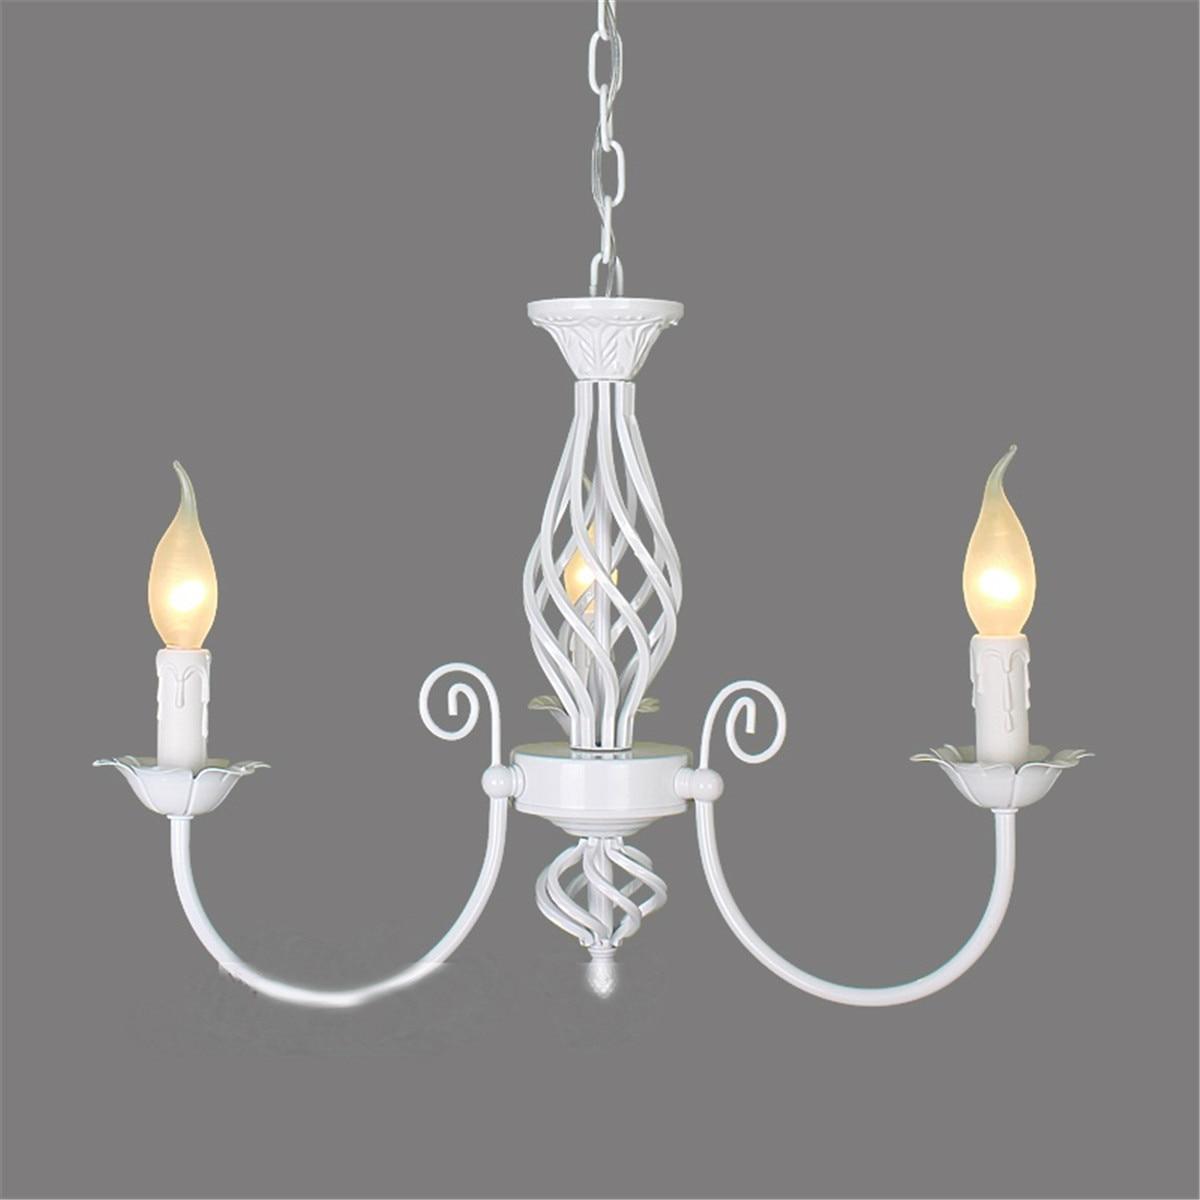 lowest price Modern LED Crystal Ceiling Light Circular Mini Colorful Ceiling Lamp Luminarias Rotunda Light For Living Room Aisle Corridor Ki